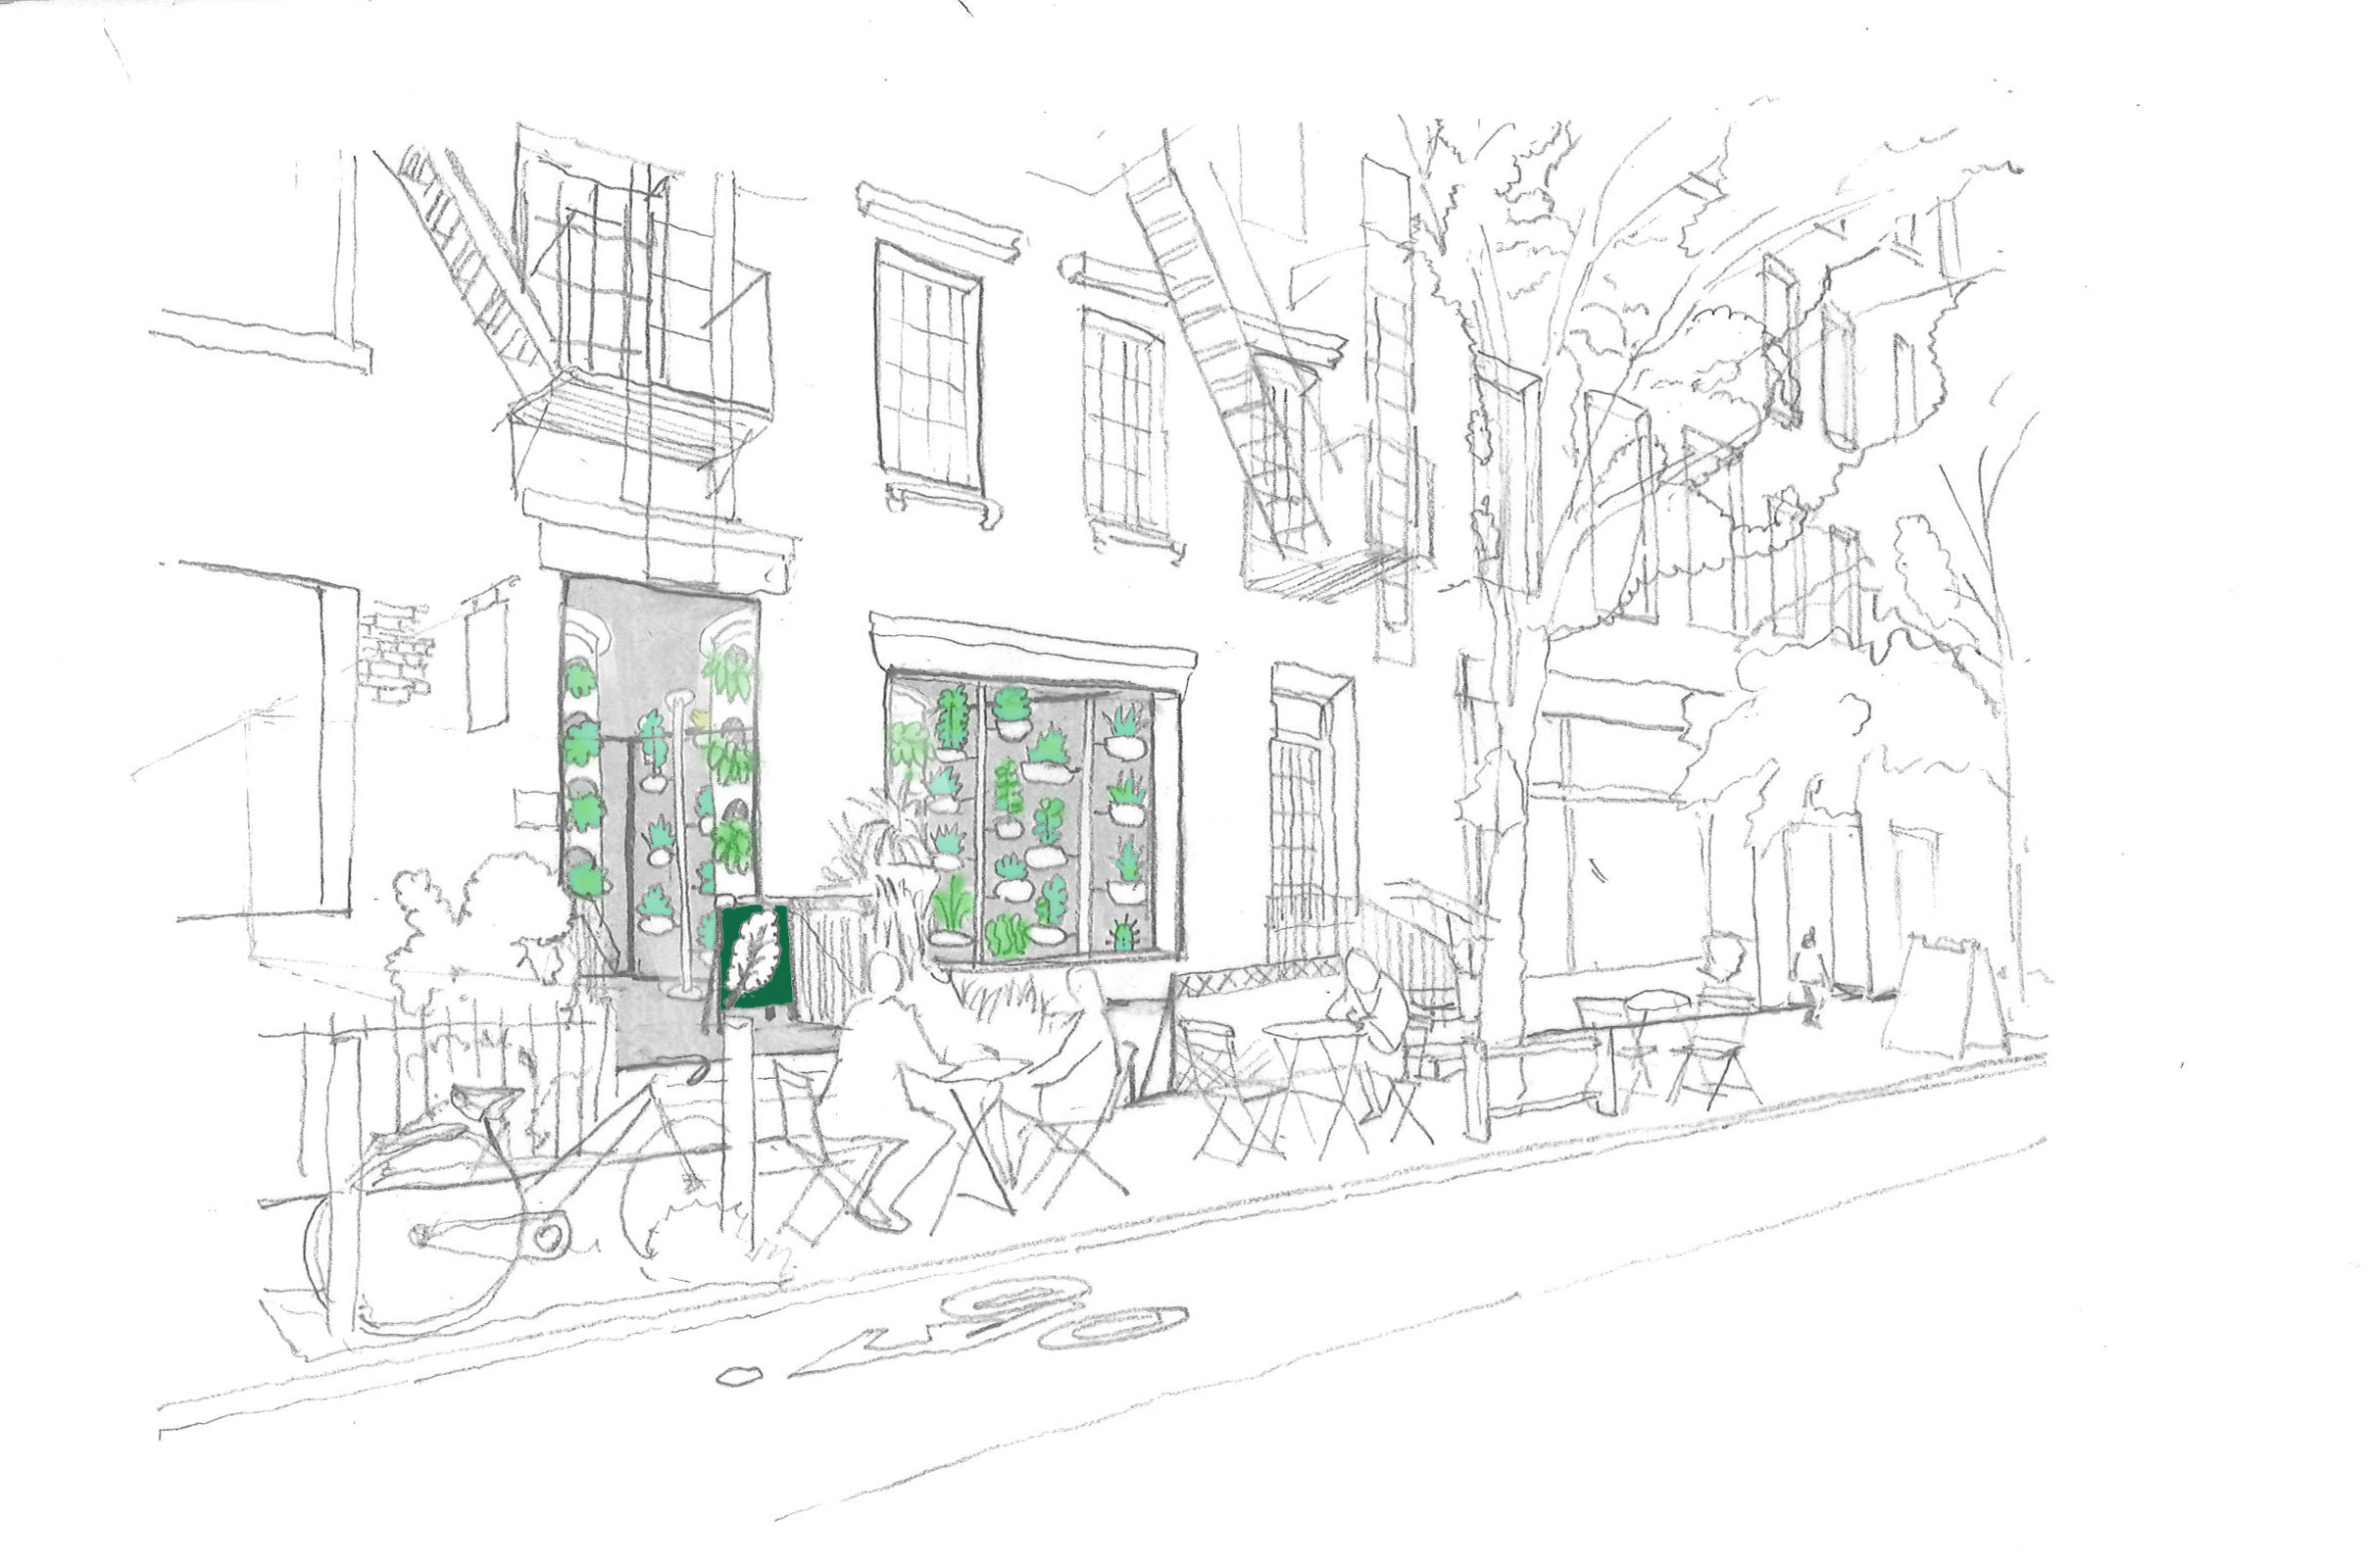 https://www.spectorgroup.com/wp-content/uploads/2021/03/sketch-10-colored.jpg